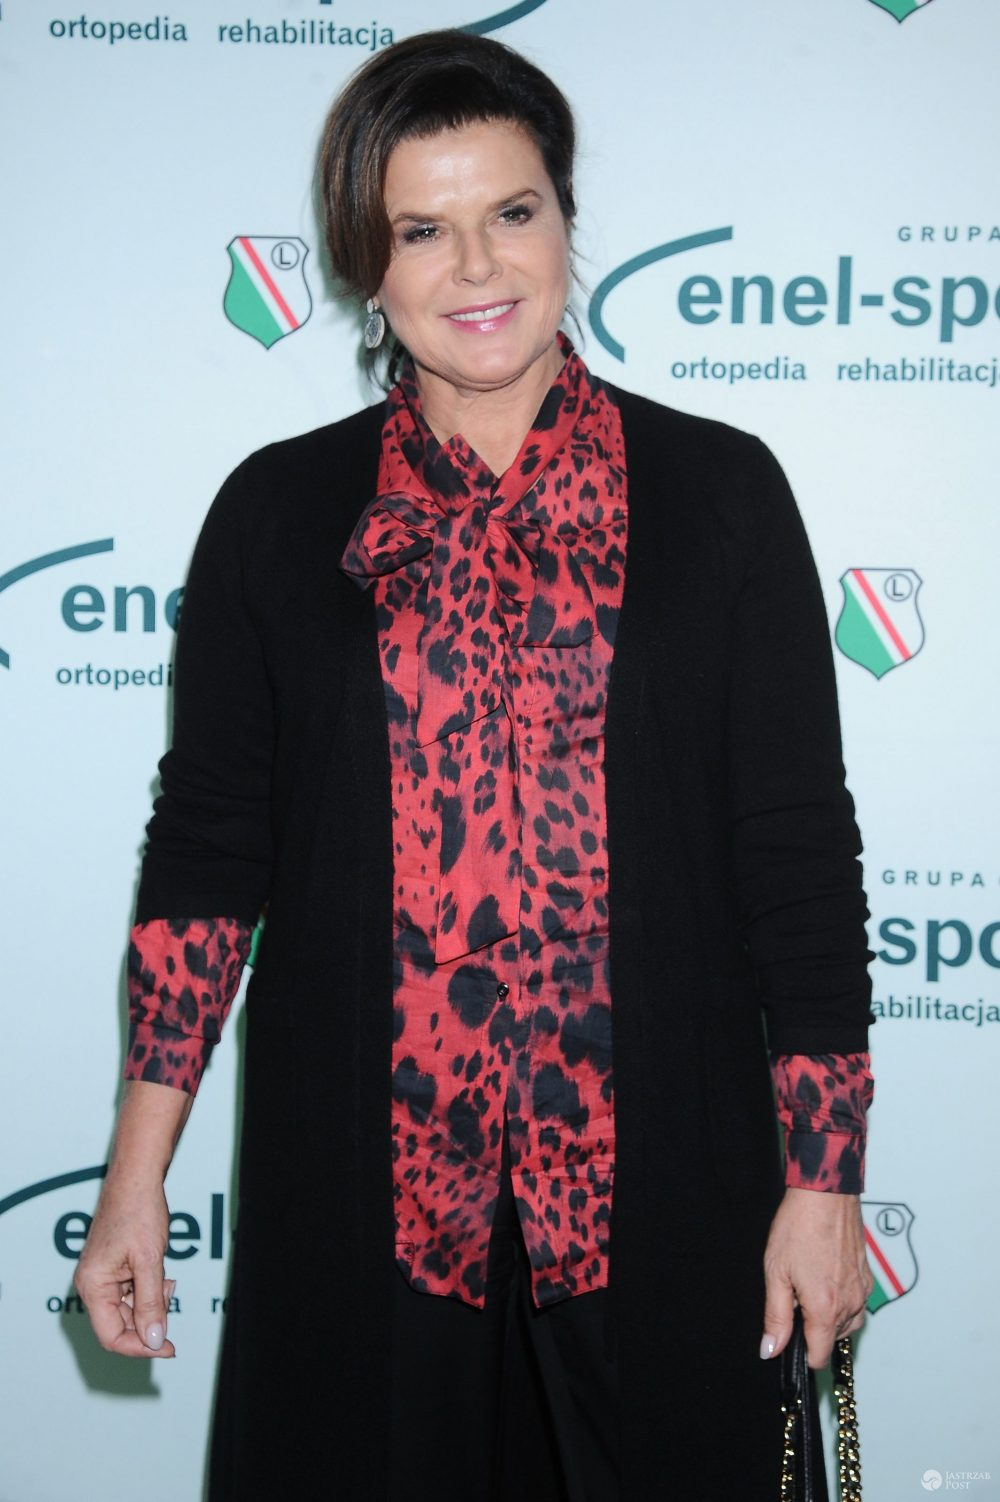 Alicja Resich-Modlińska (fot. ONS)